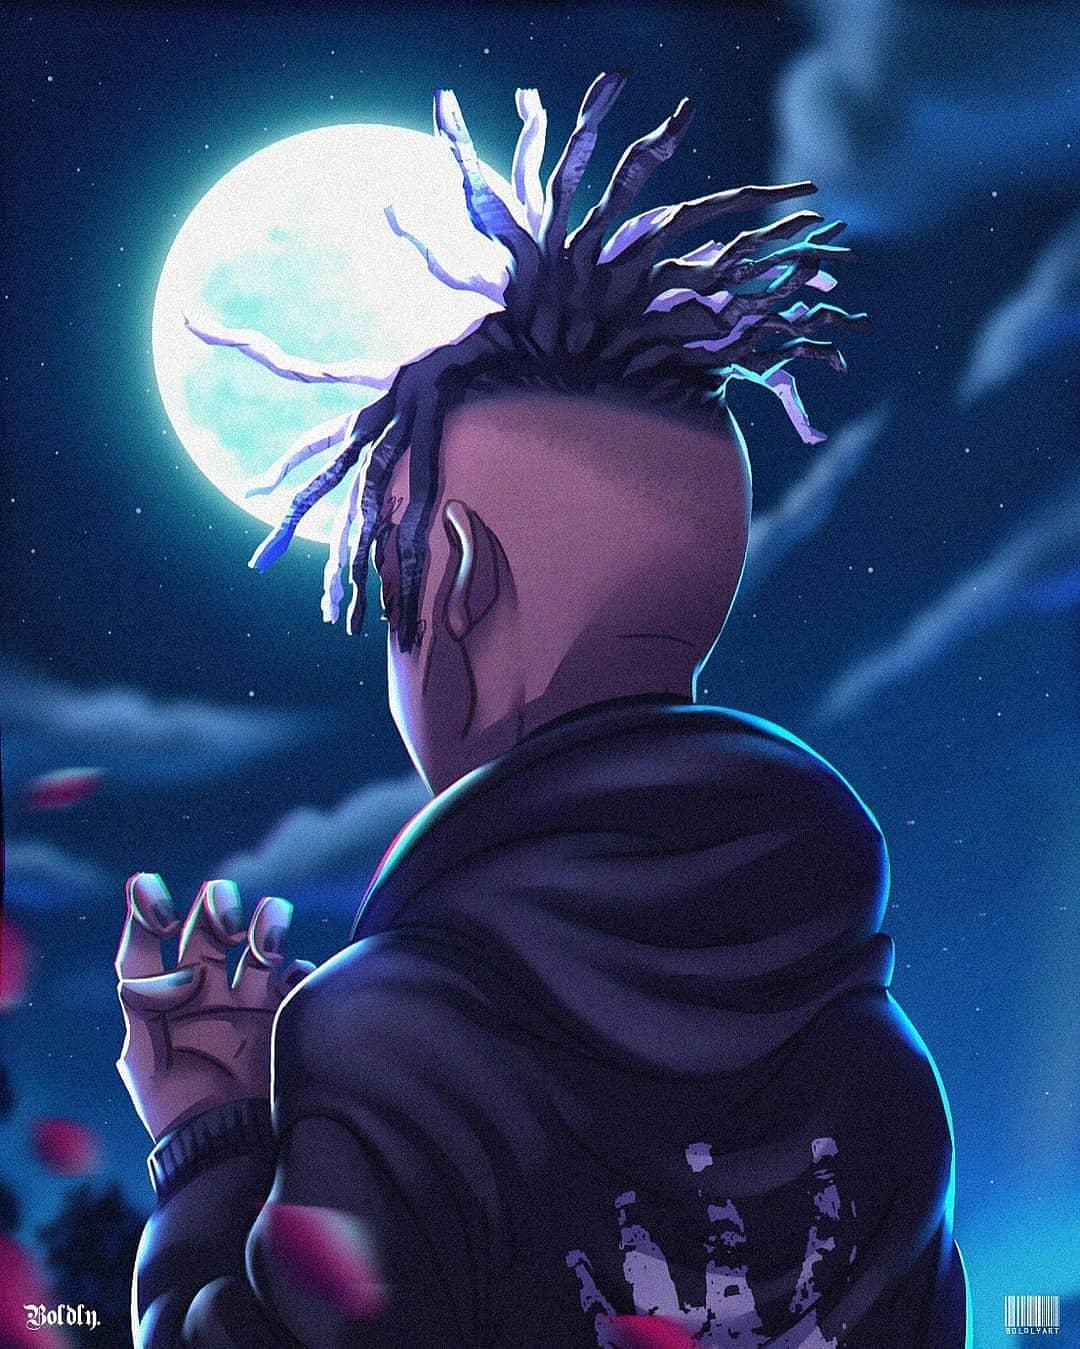 Cartoon XXXTentacion Anime Wallpapers - Wallpaper Cave